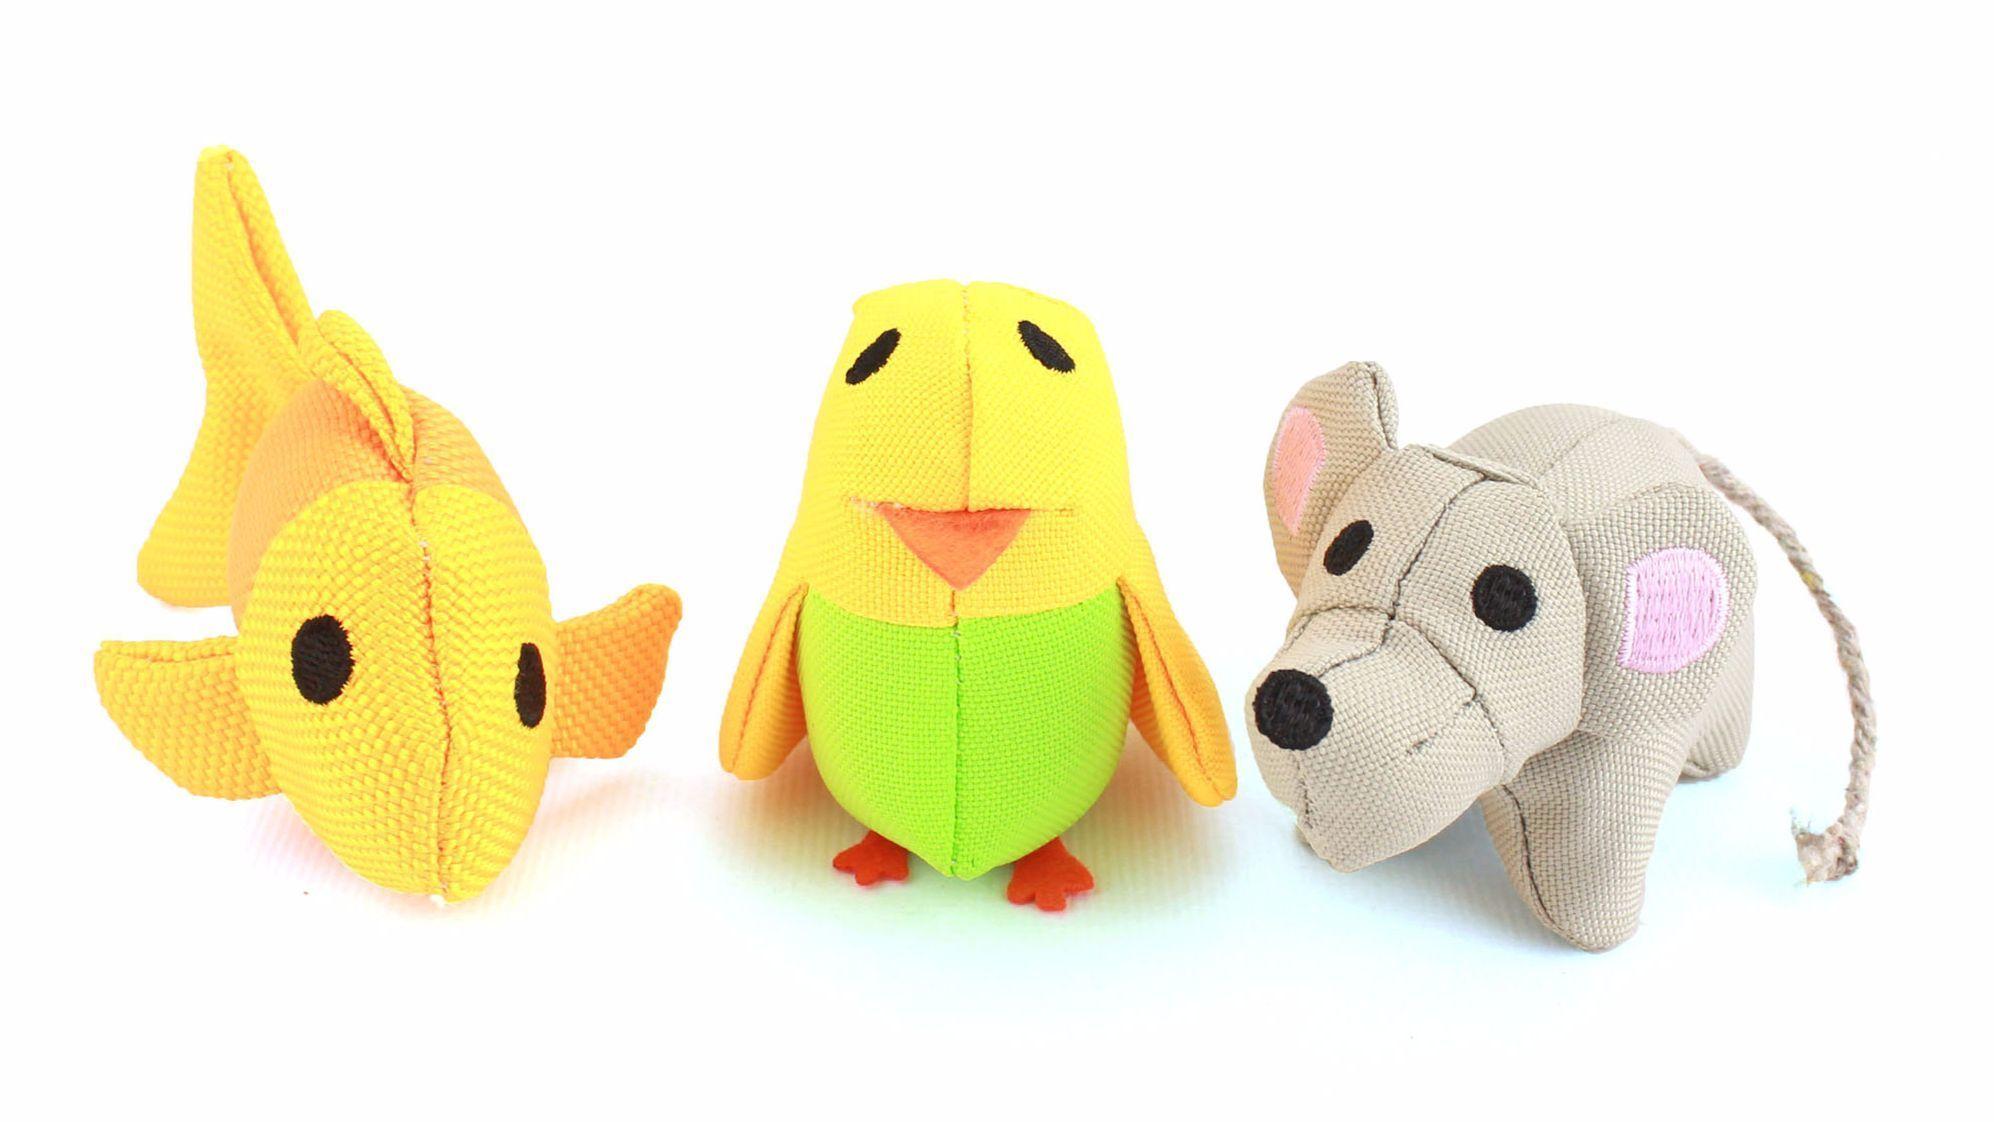 Beco's cat toys